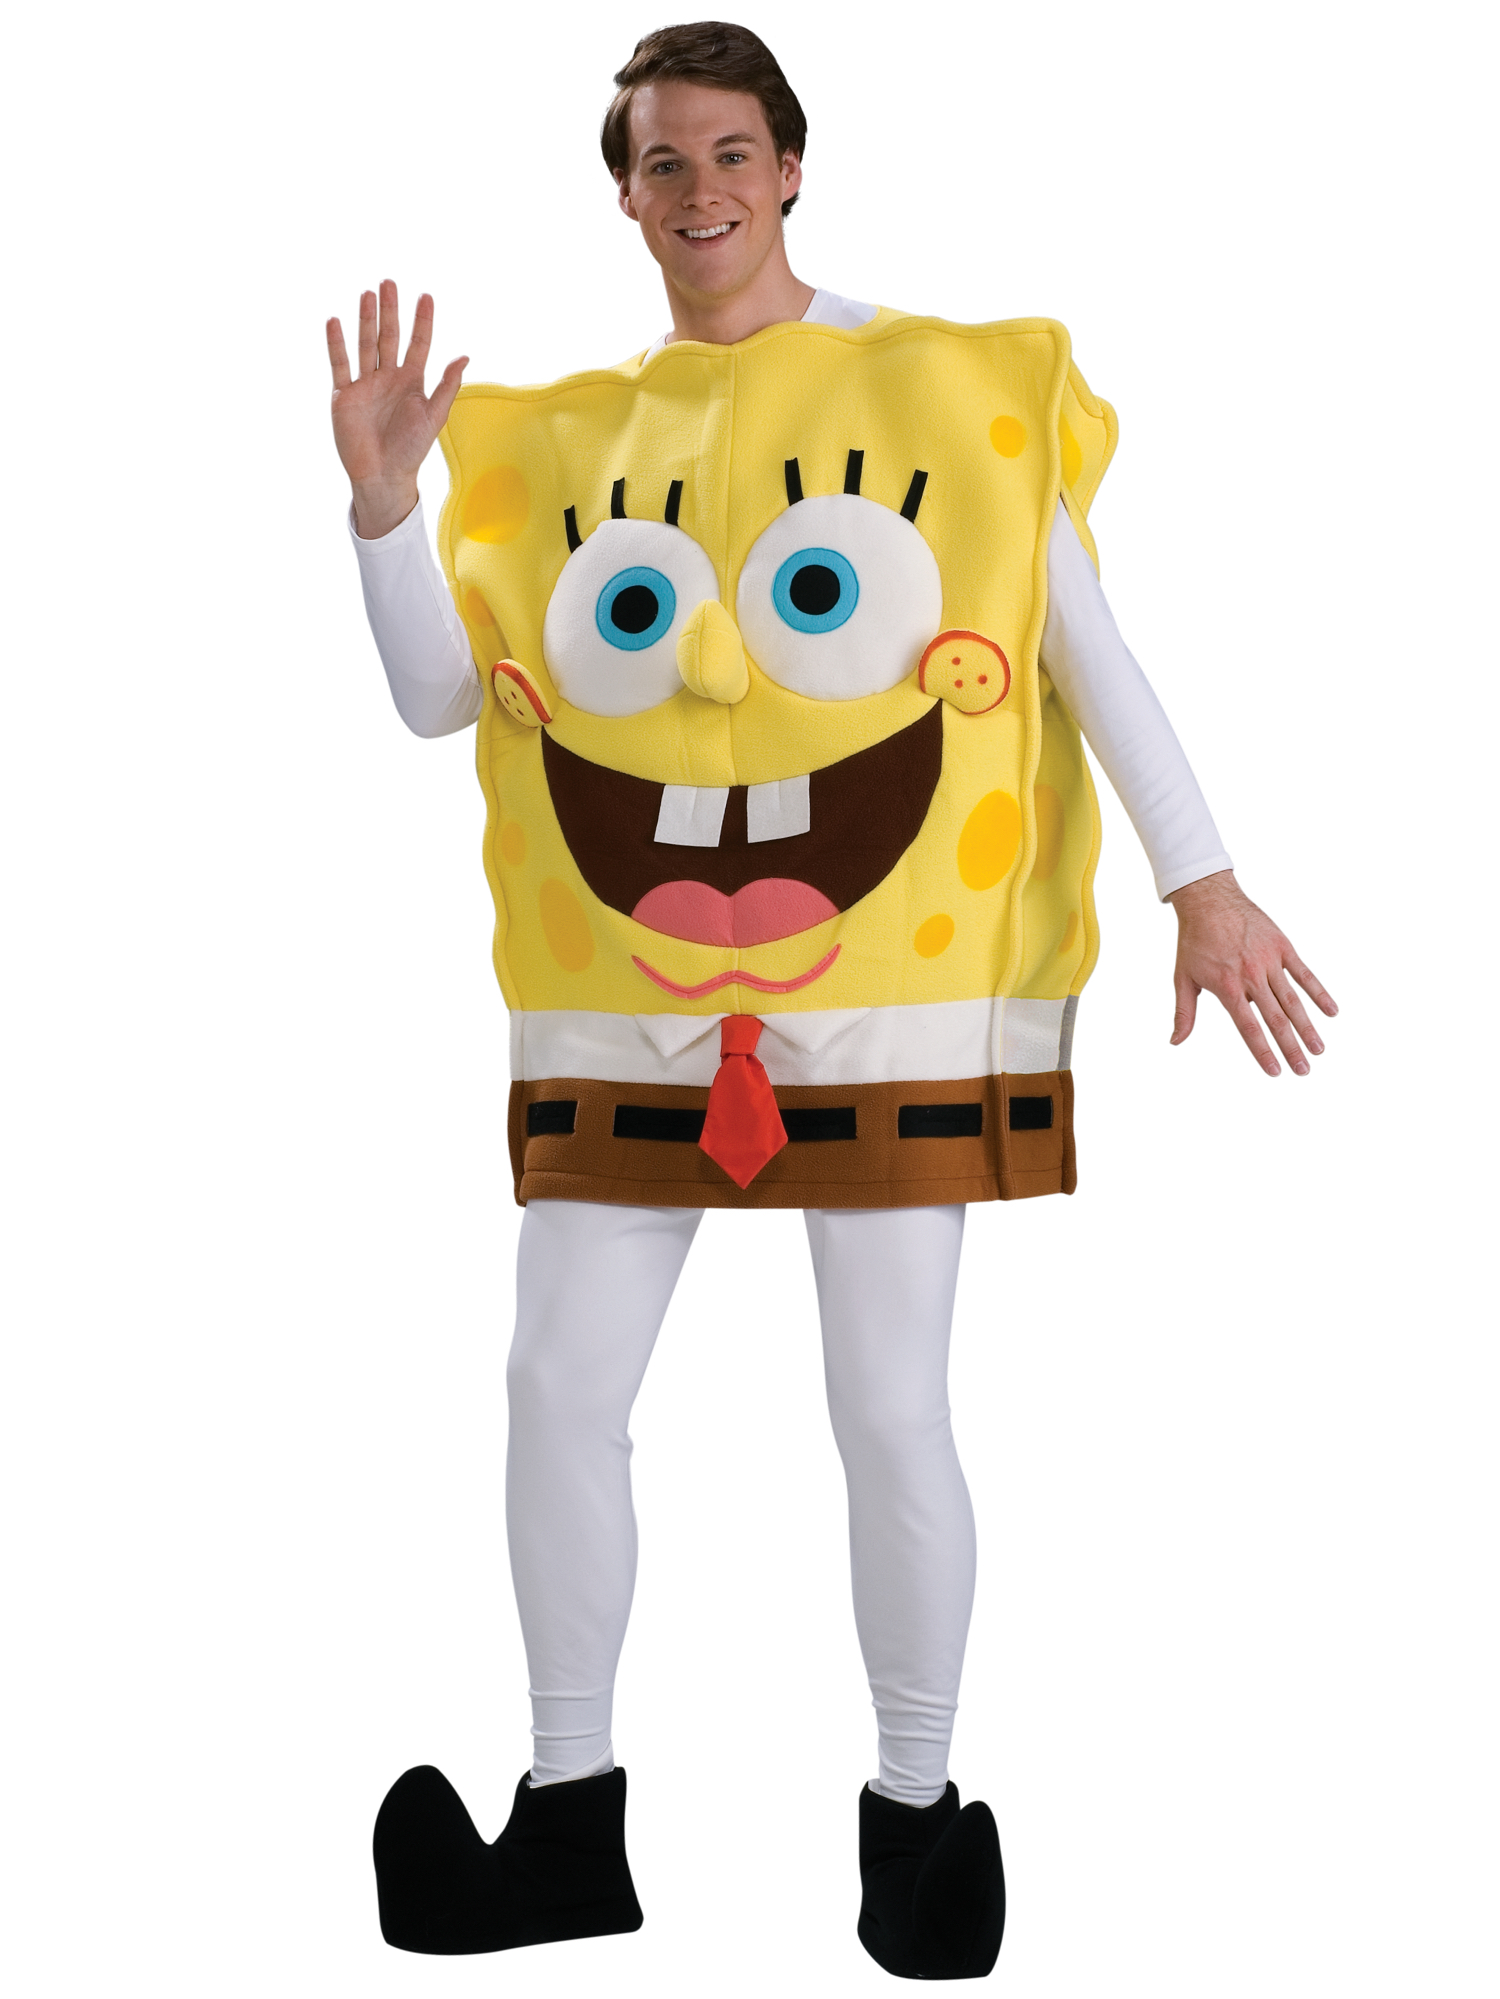 spongebob squarepants deluxe nickelodeon cartoon tv move